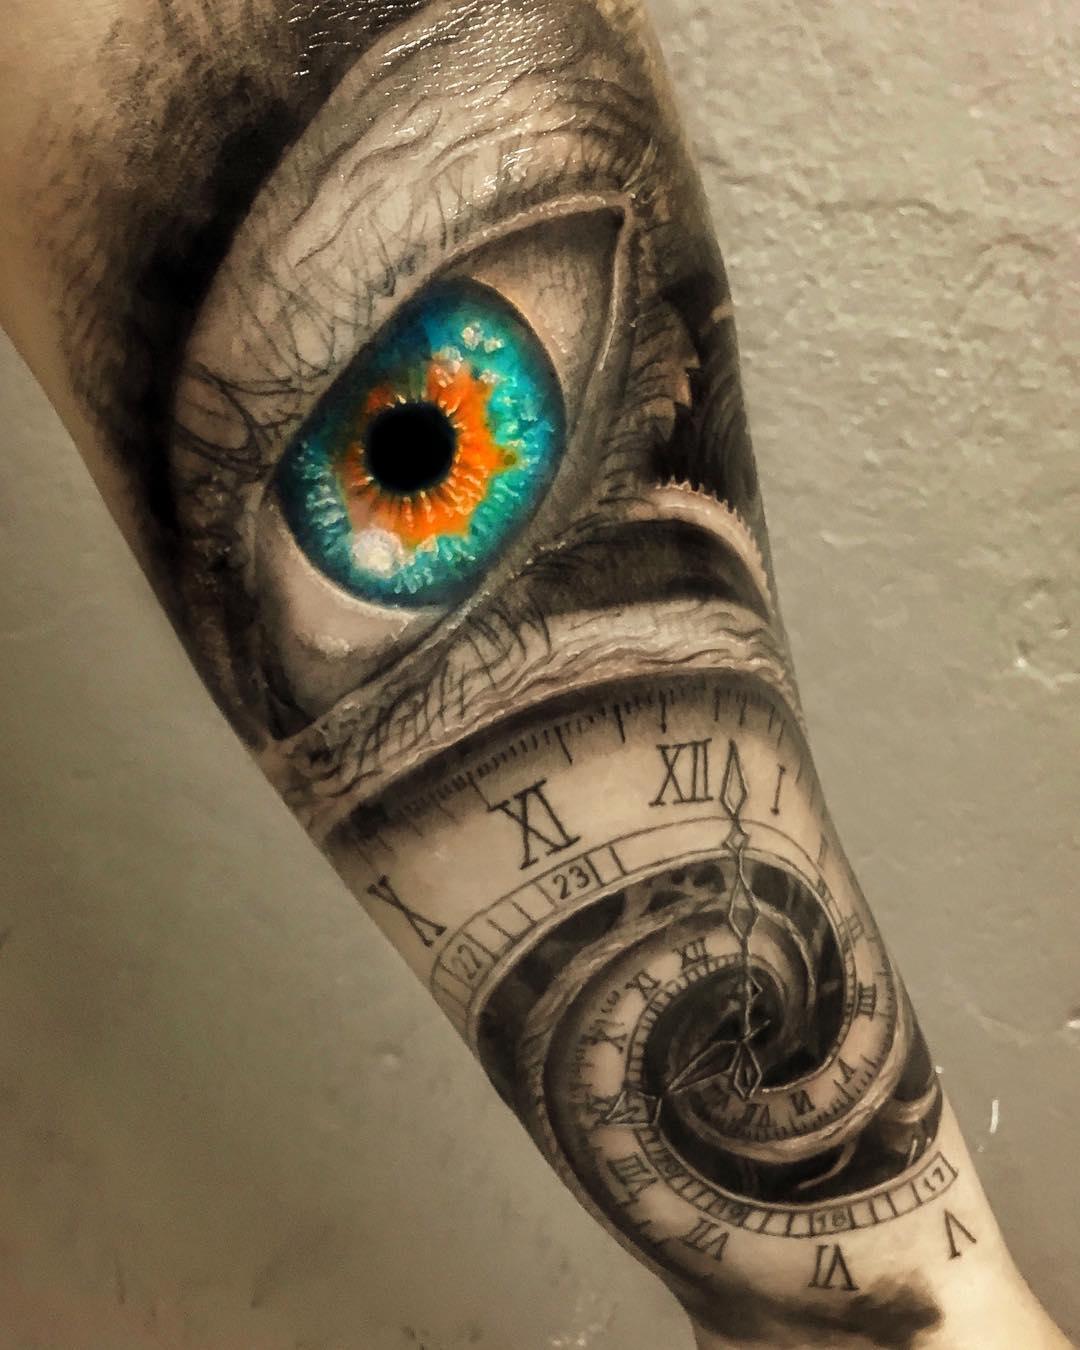 Тату Разноцветный Глаз и Часы на Руке